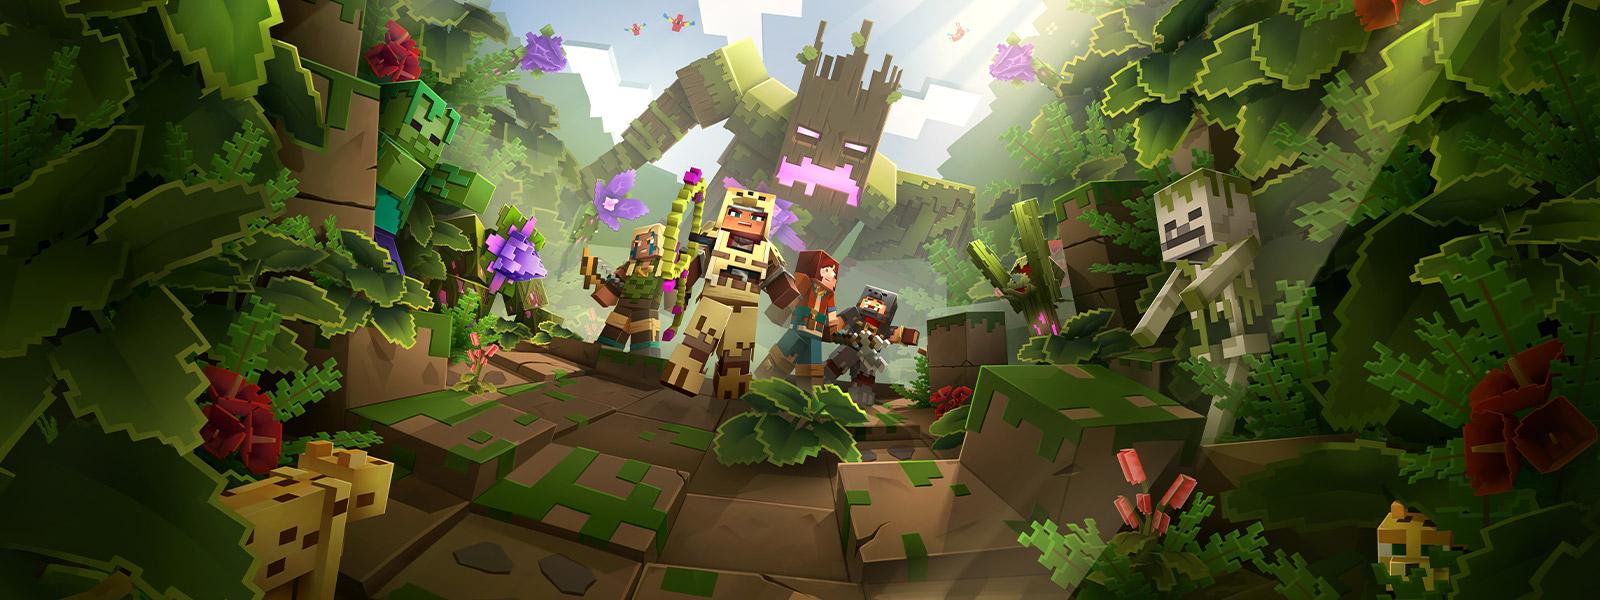 Minecraft Dungeons 的四個角色身處叢林,身後是一隻巨大的樹怪